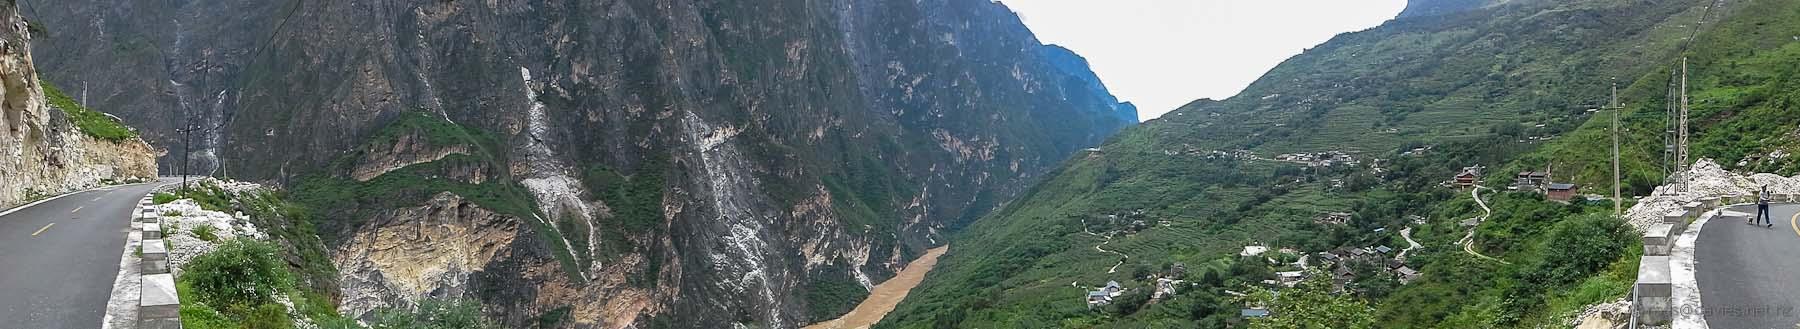 Walnut Garden Tiger Leaping Gorge